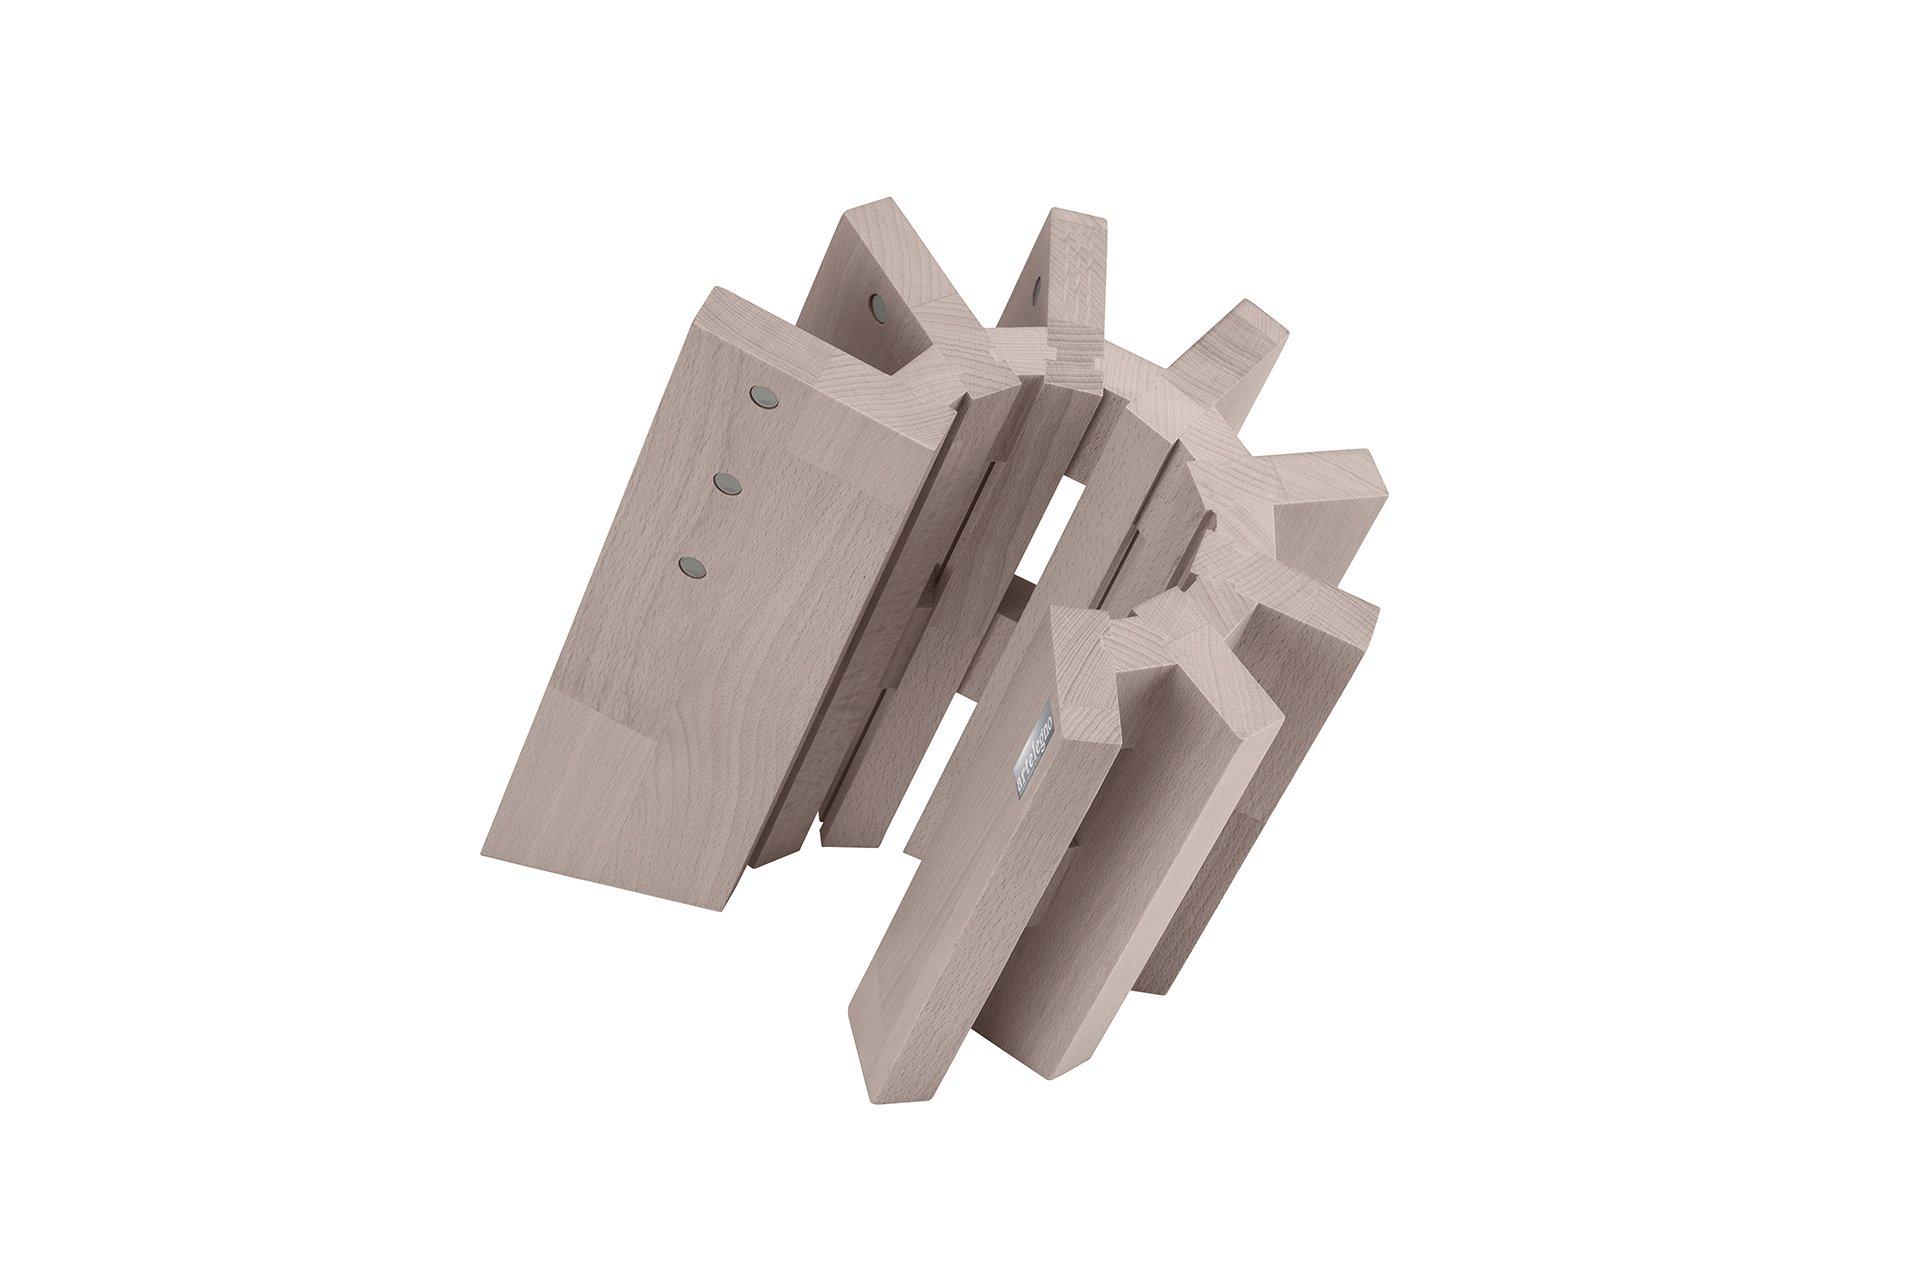 Artelegno 51/W Pisa Magnetic Knife Block, Solid Beech Wood Whitewashed Finish